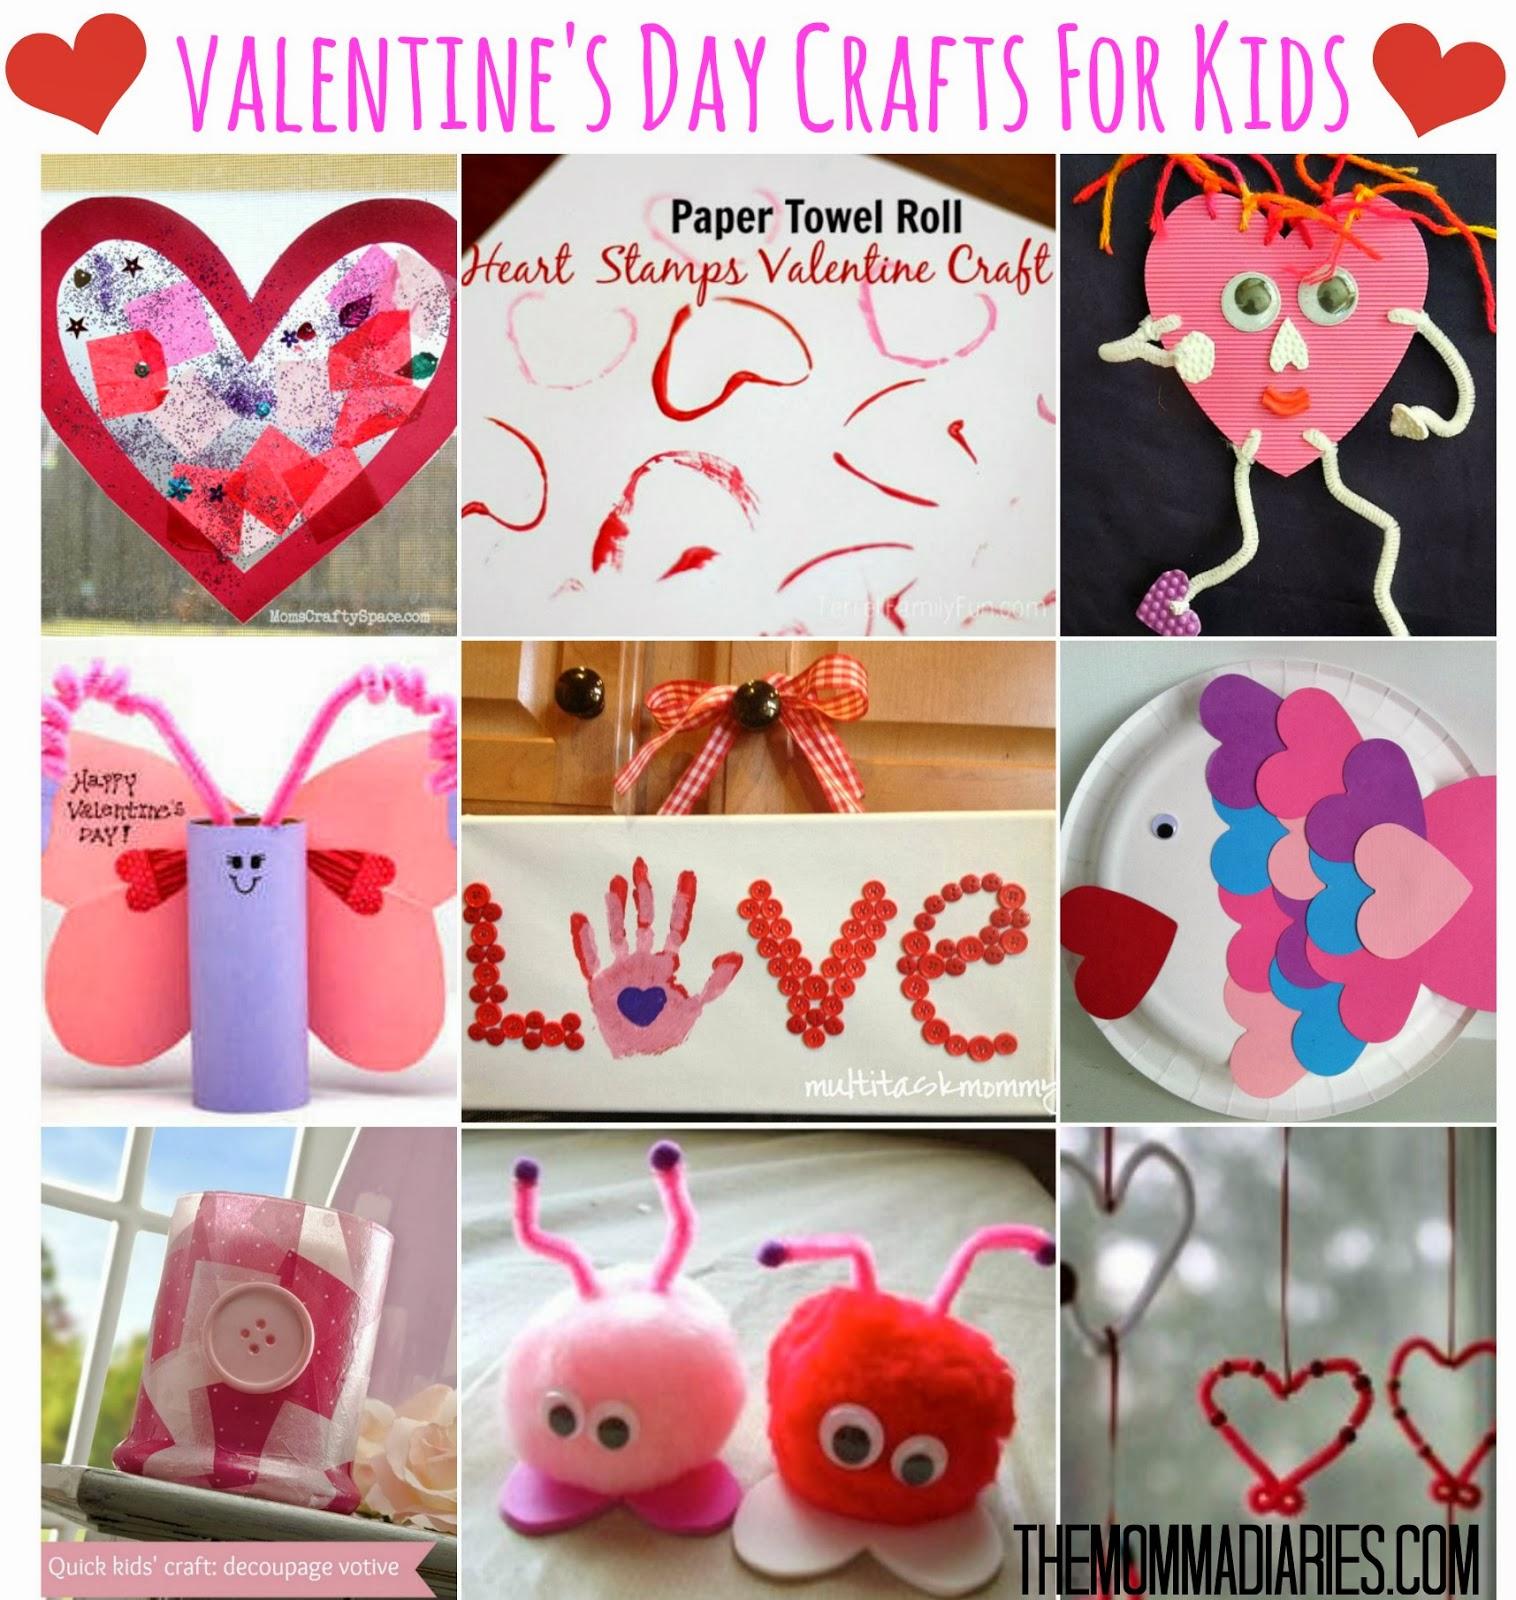 #Valentines #Day #Crafts For #Kids